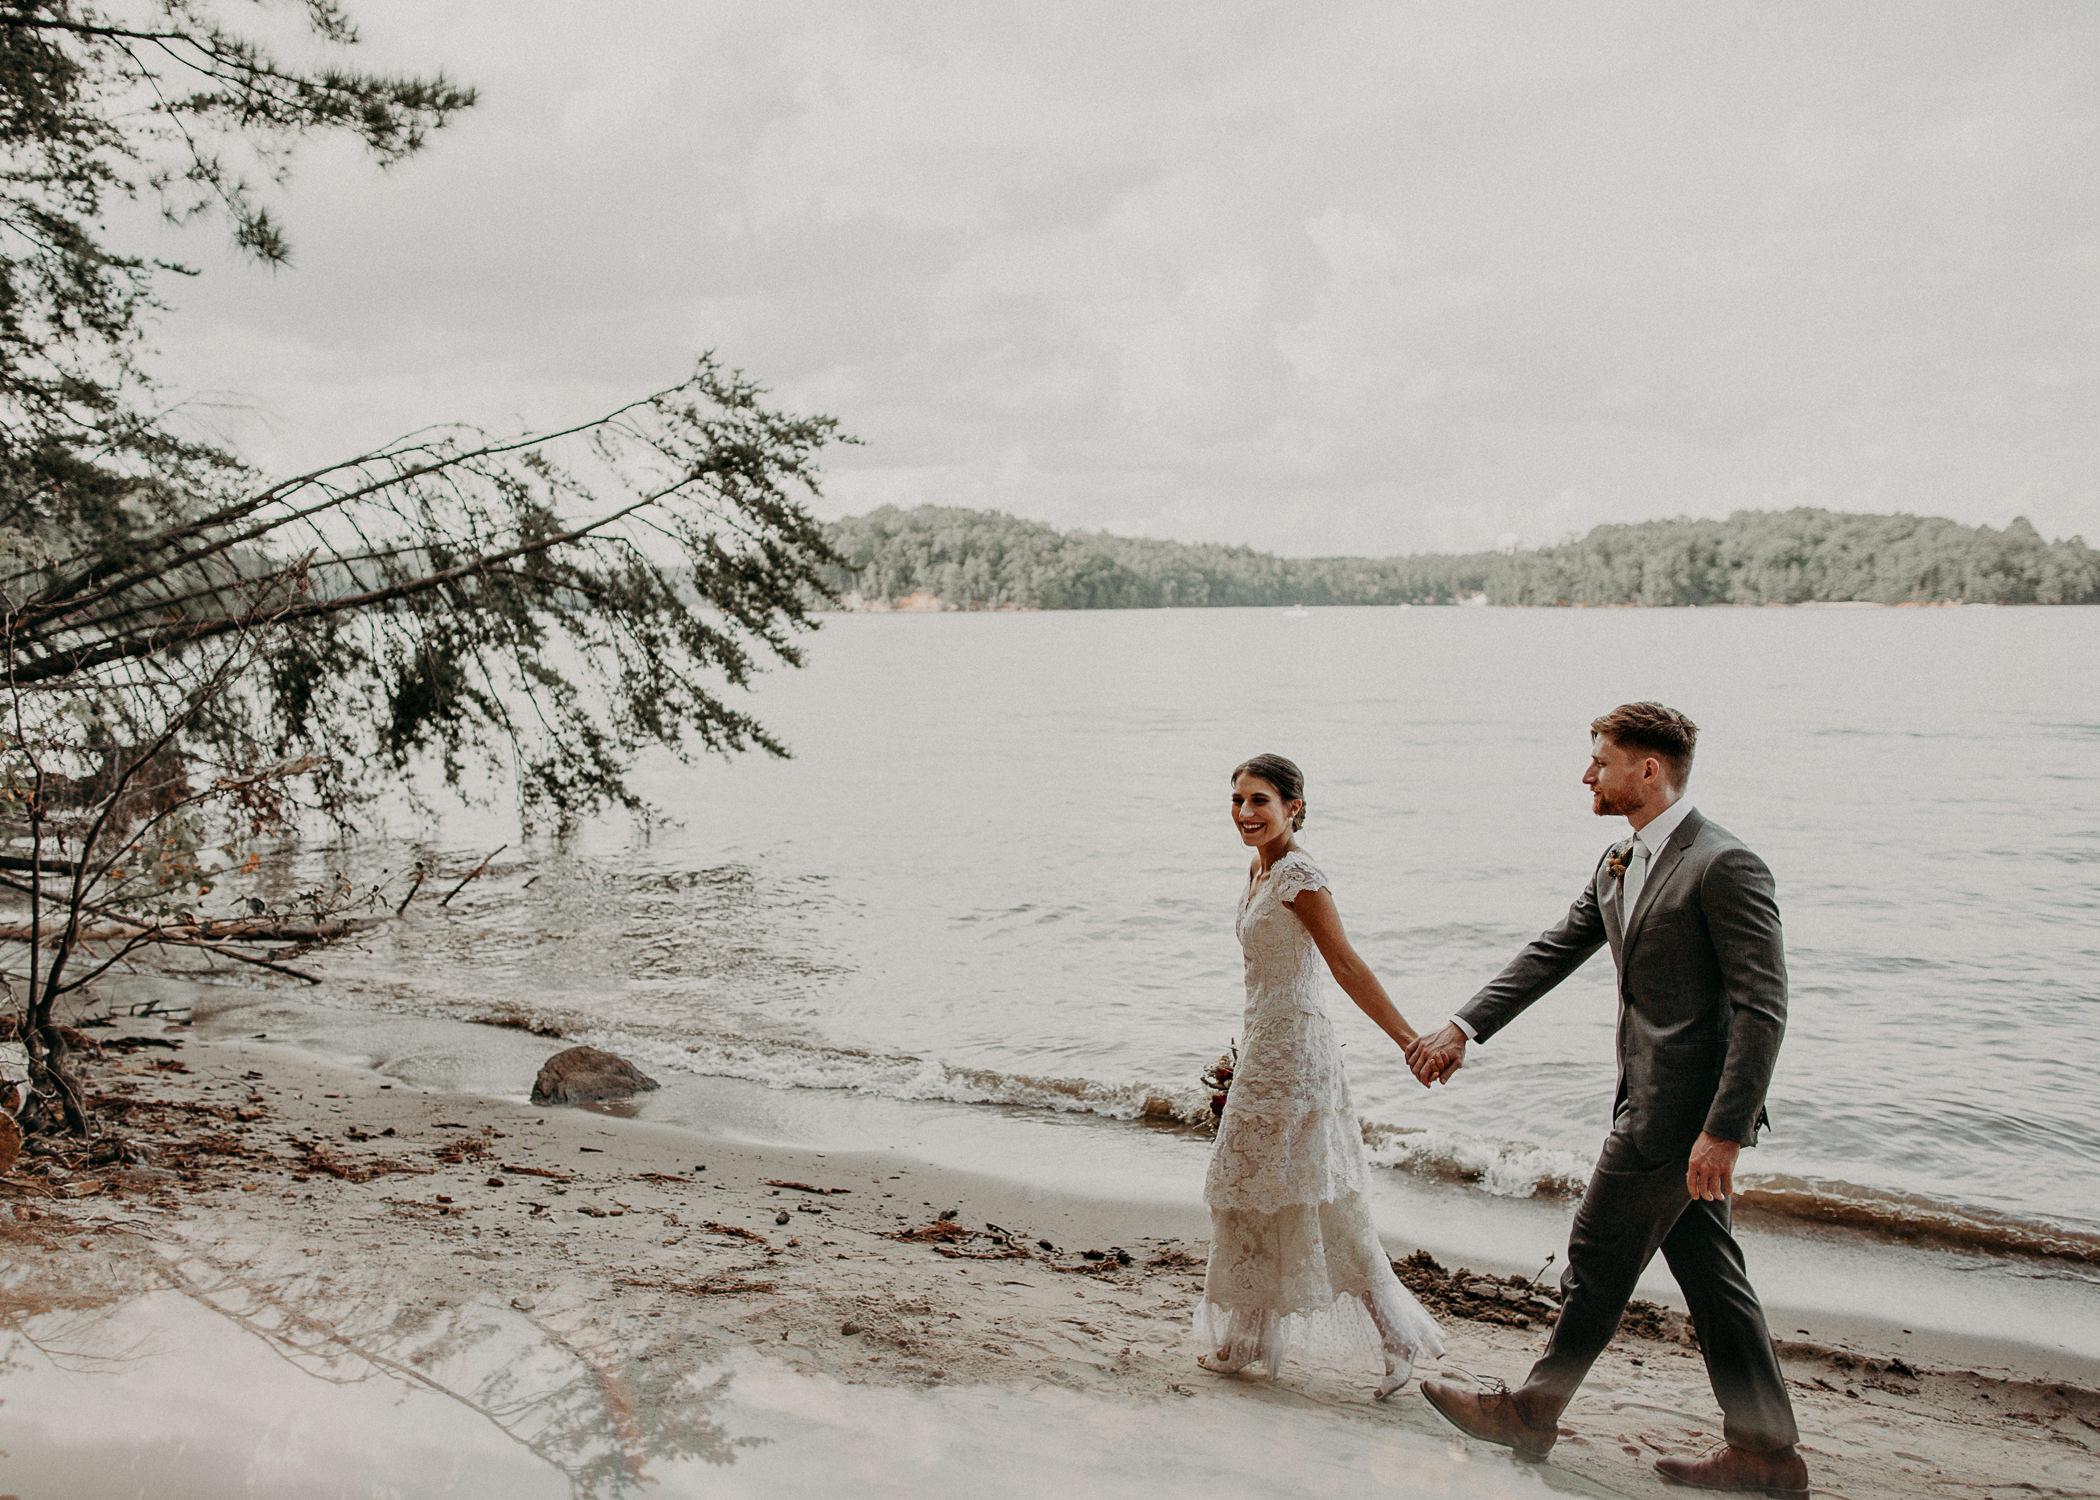 55 Bride & Groom Portraits before the ceremony on wedding day - Atlanta Wedding Photographer .jpg